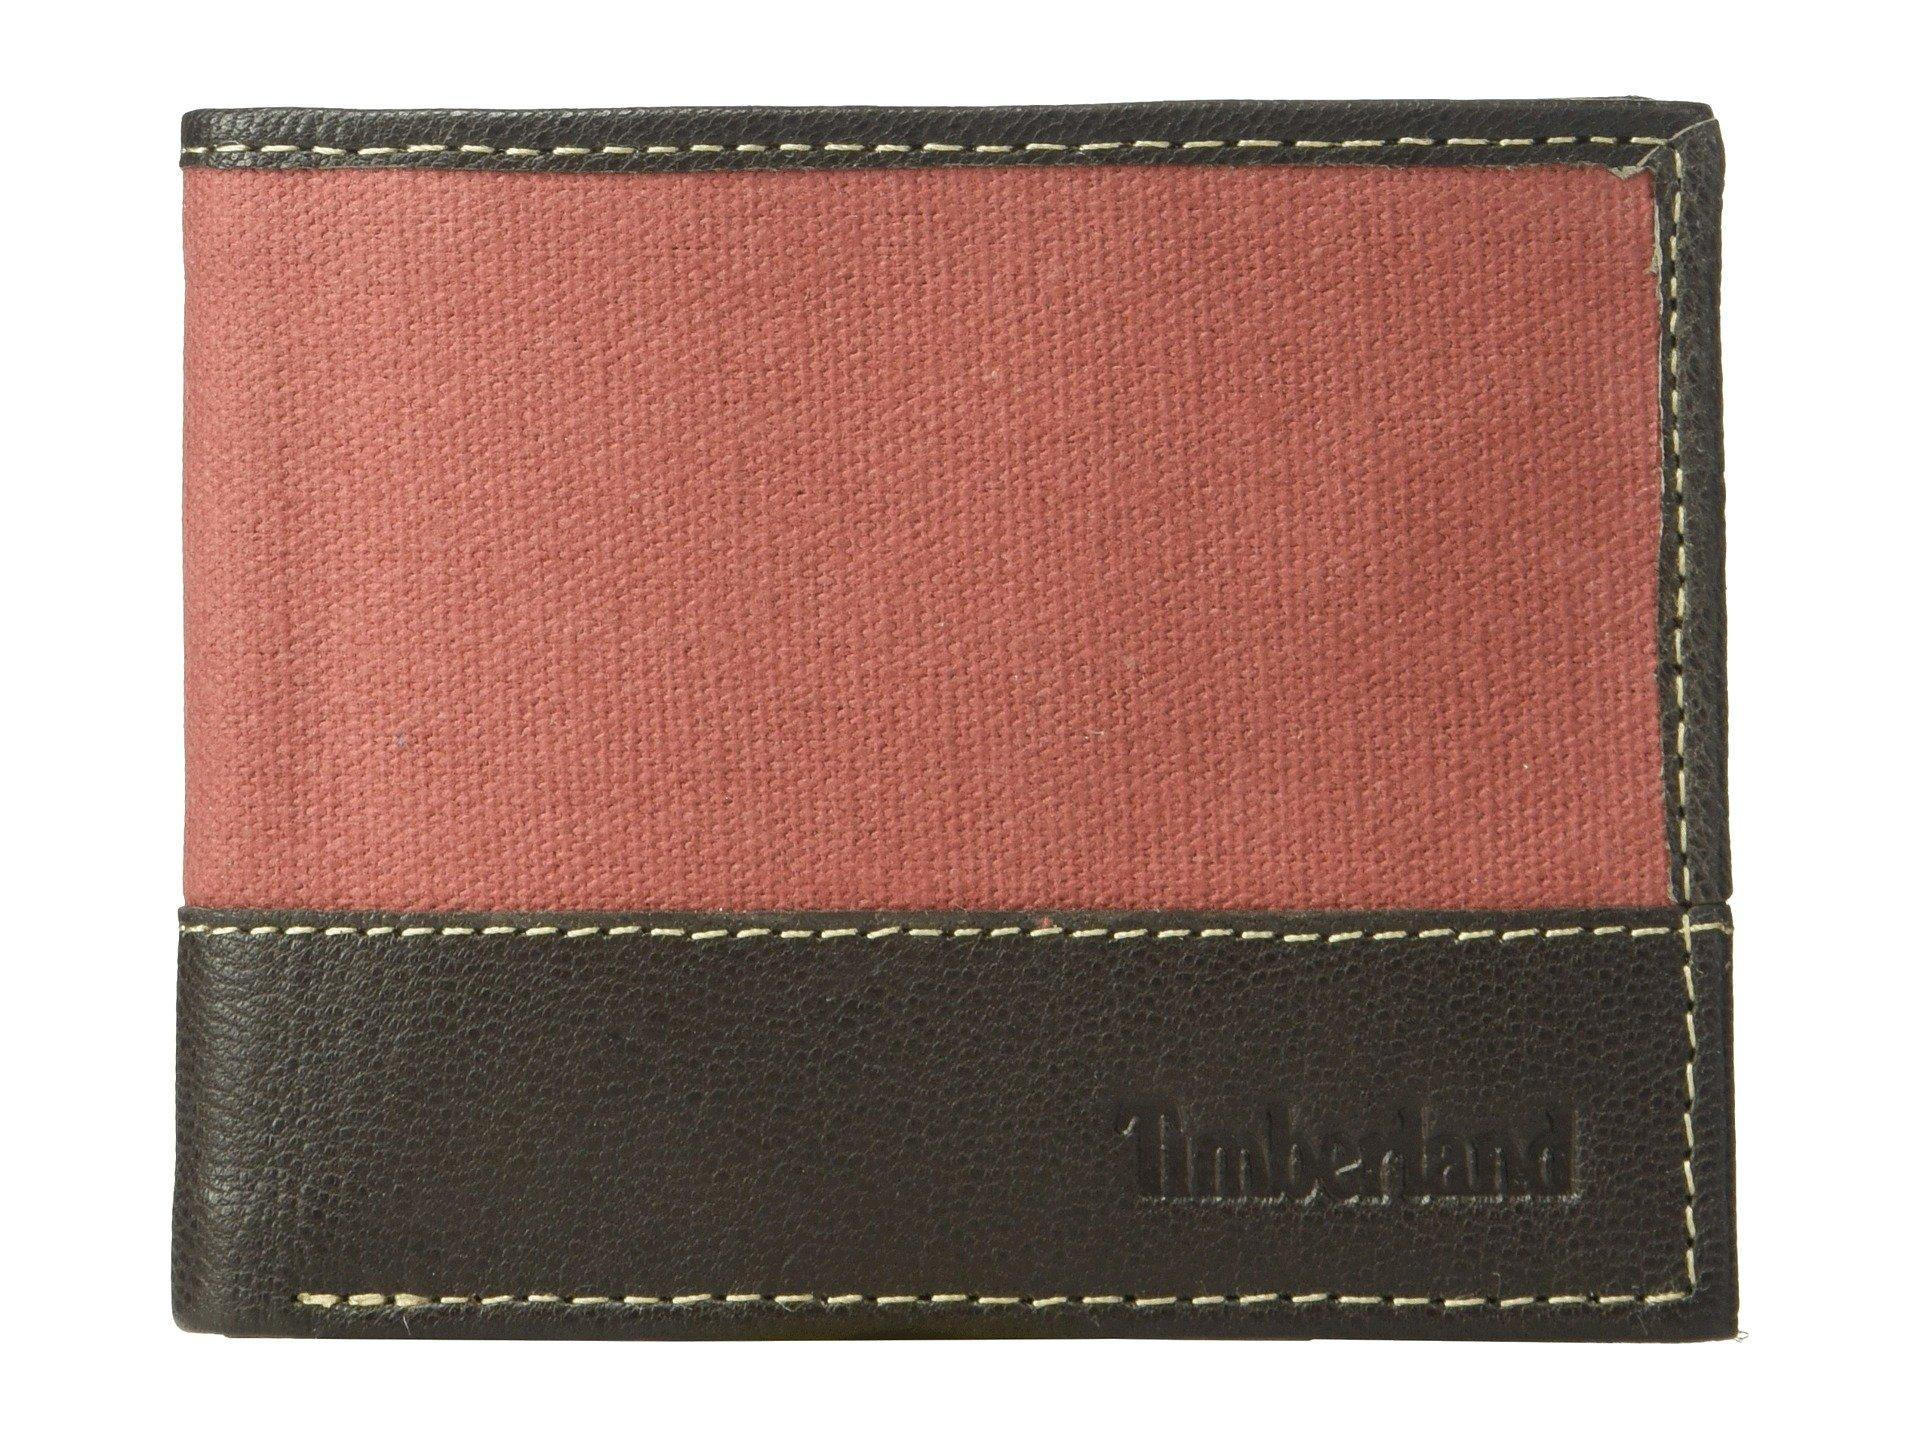 Billetera para Hombre Timberland Canvas andamp; Leather Billfold Set  + Timberland en VeoyCompro.net